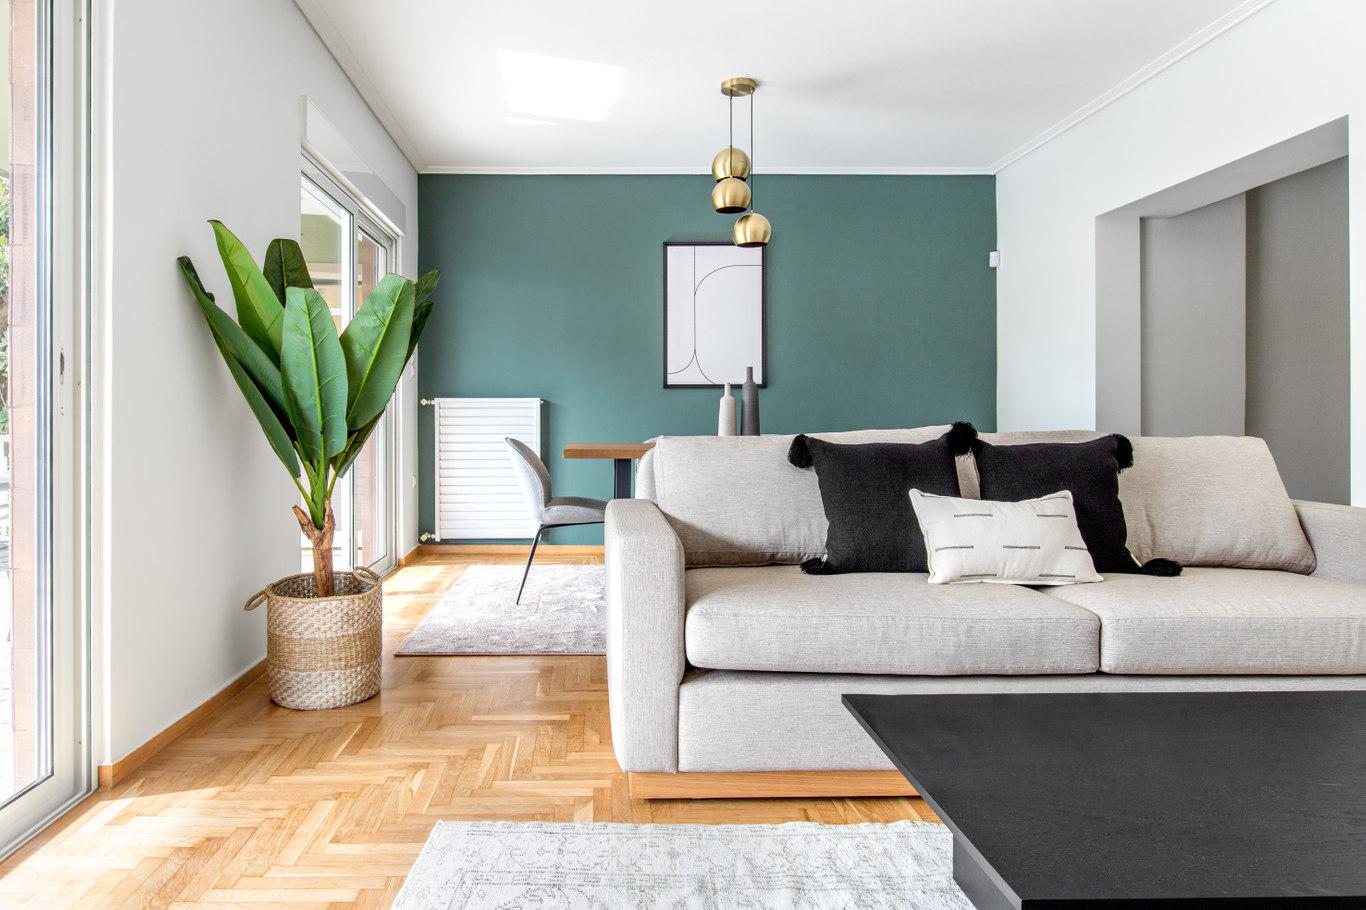 2 bedroom furnished apartment in Vasileos Pavlou VIII 1056, Voula, Athens, photo 1